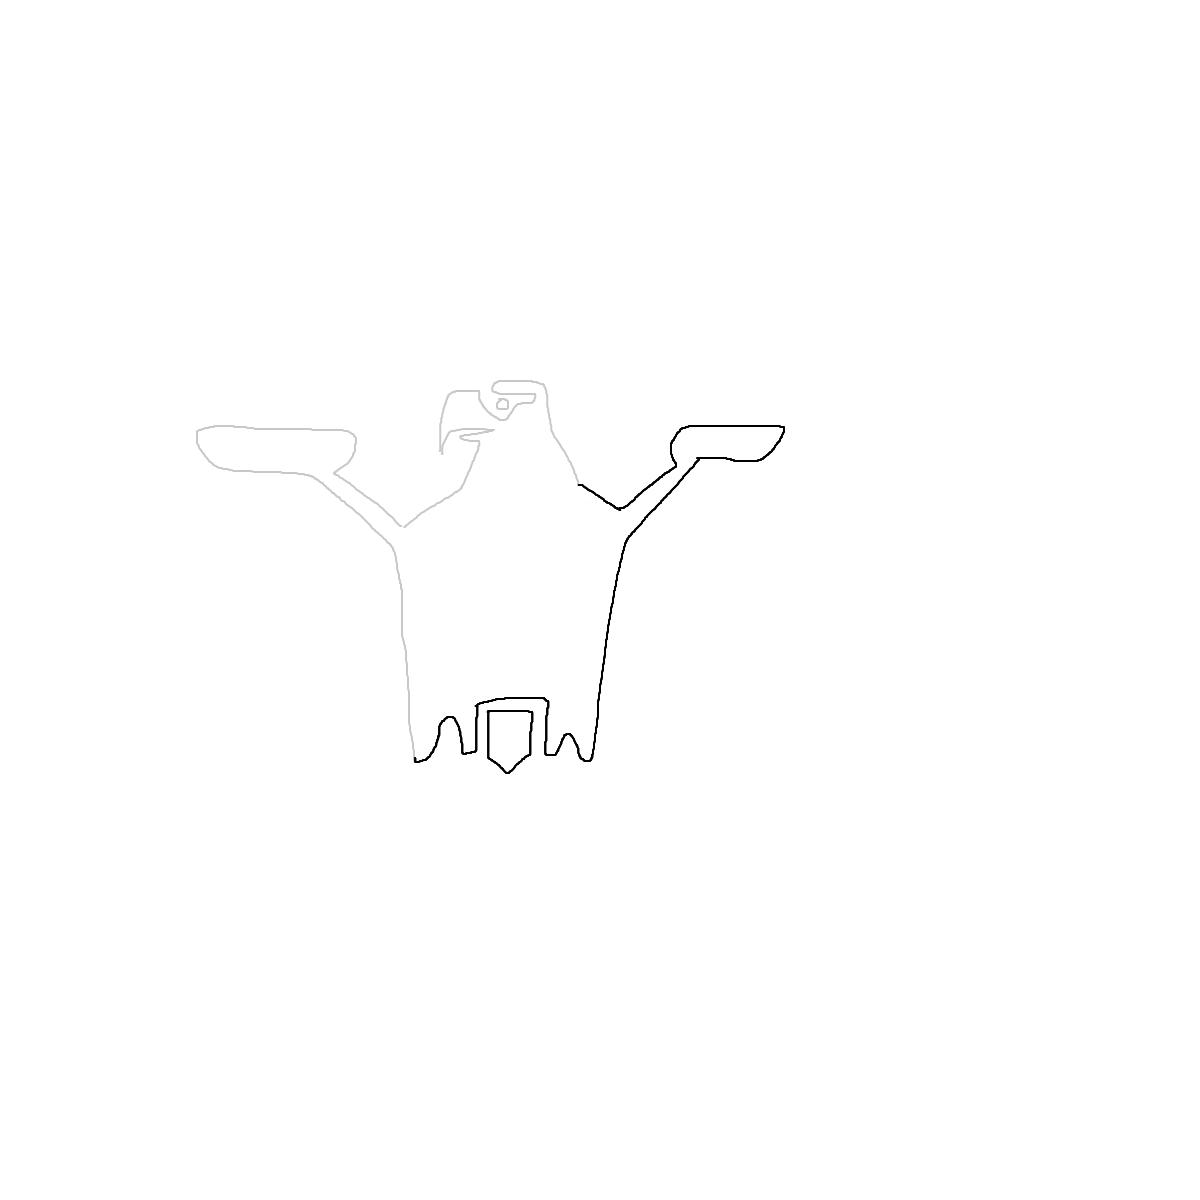 BAAAM drawing#19127 lat:60.3900756835937500lng: 25.6671028137207030